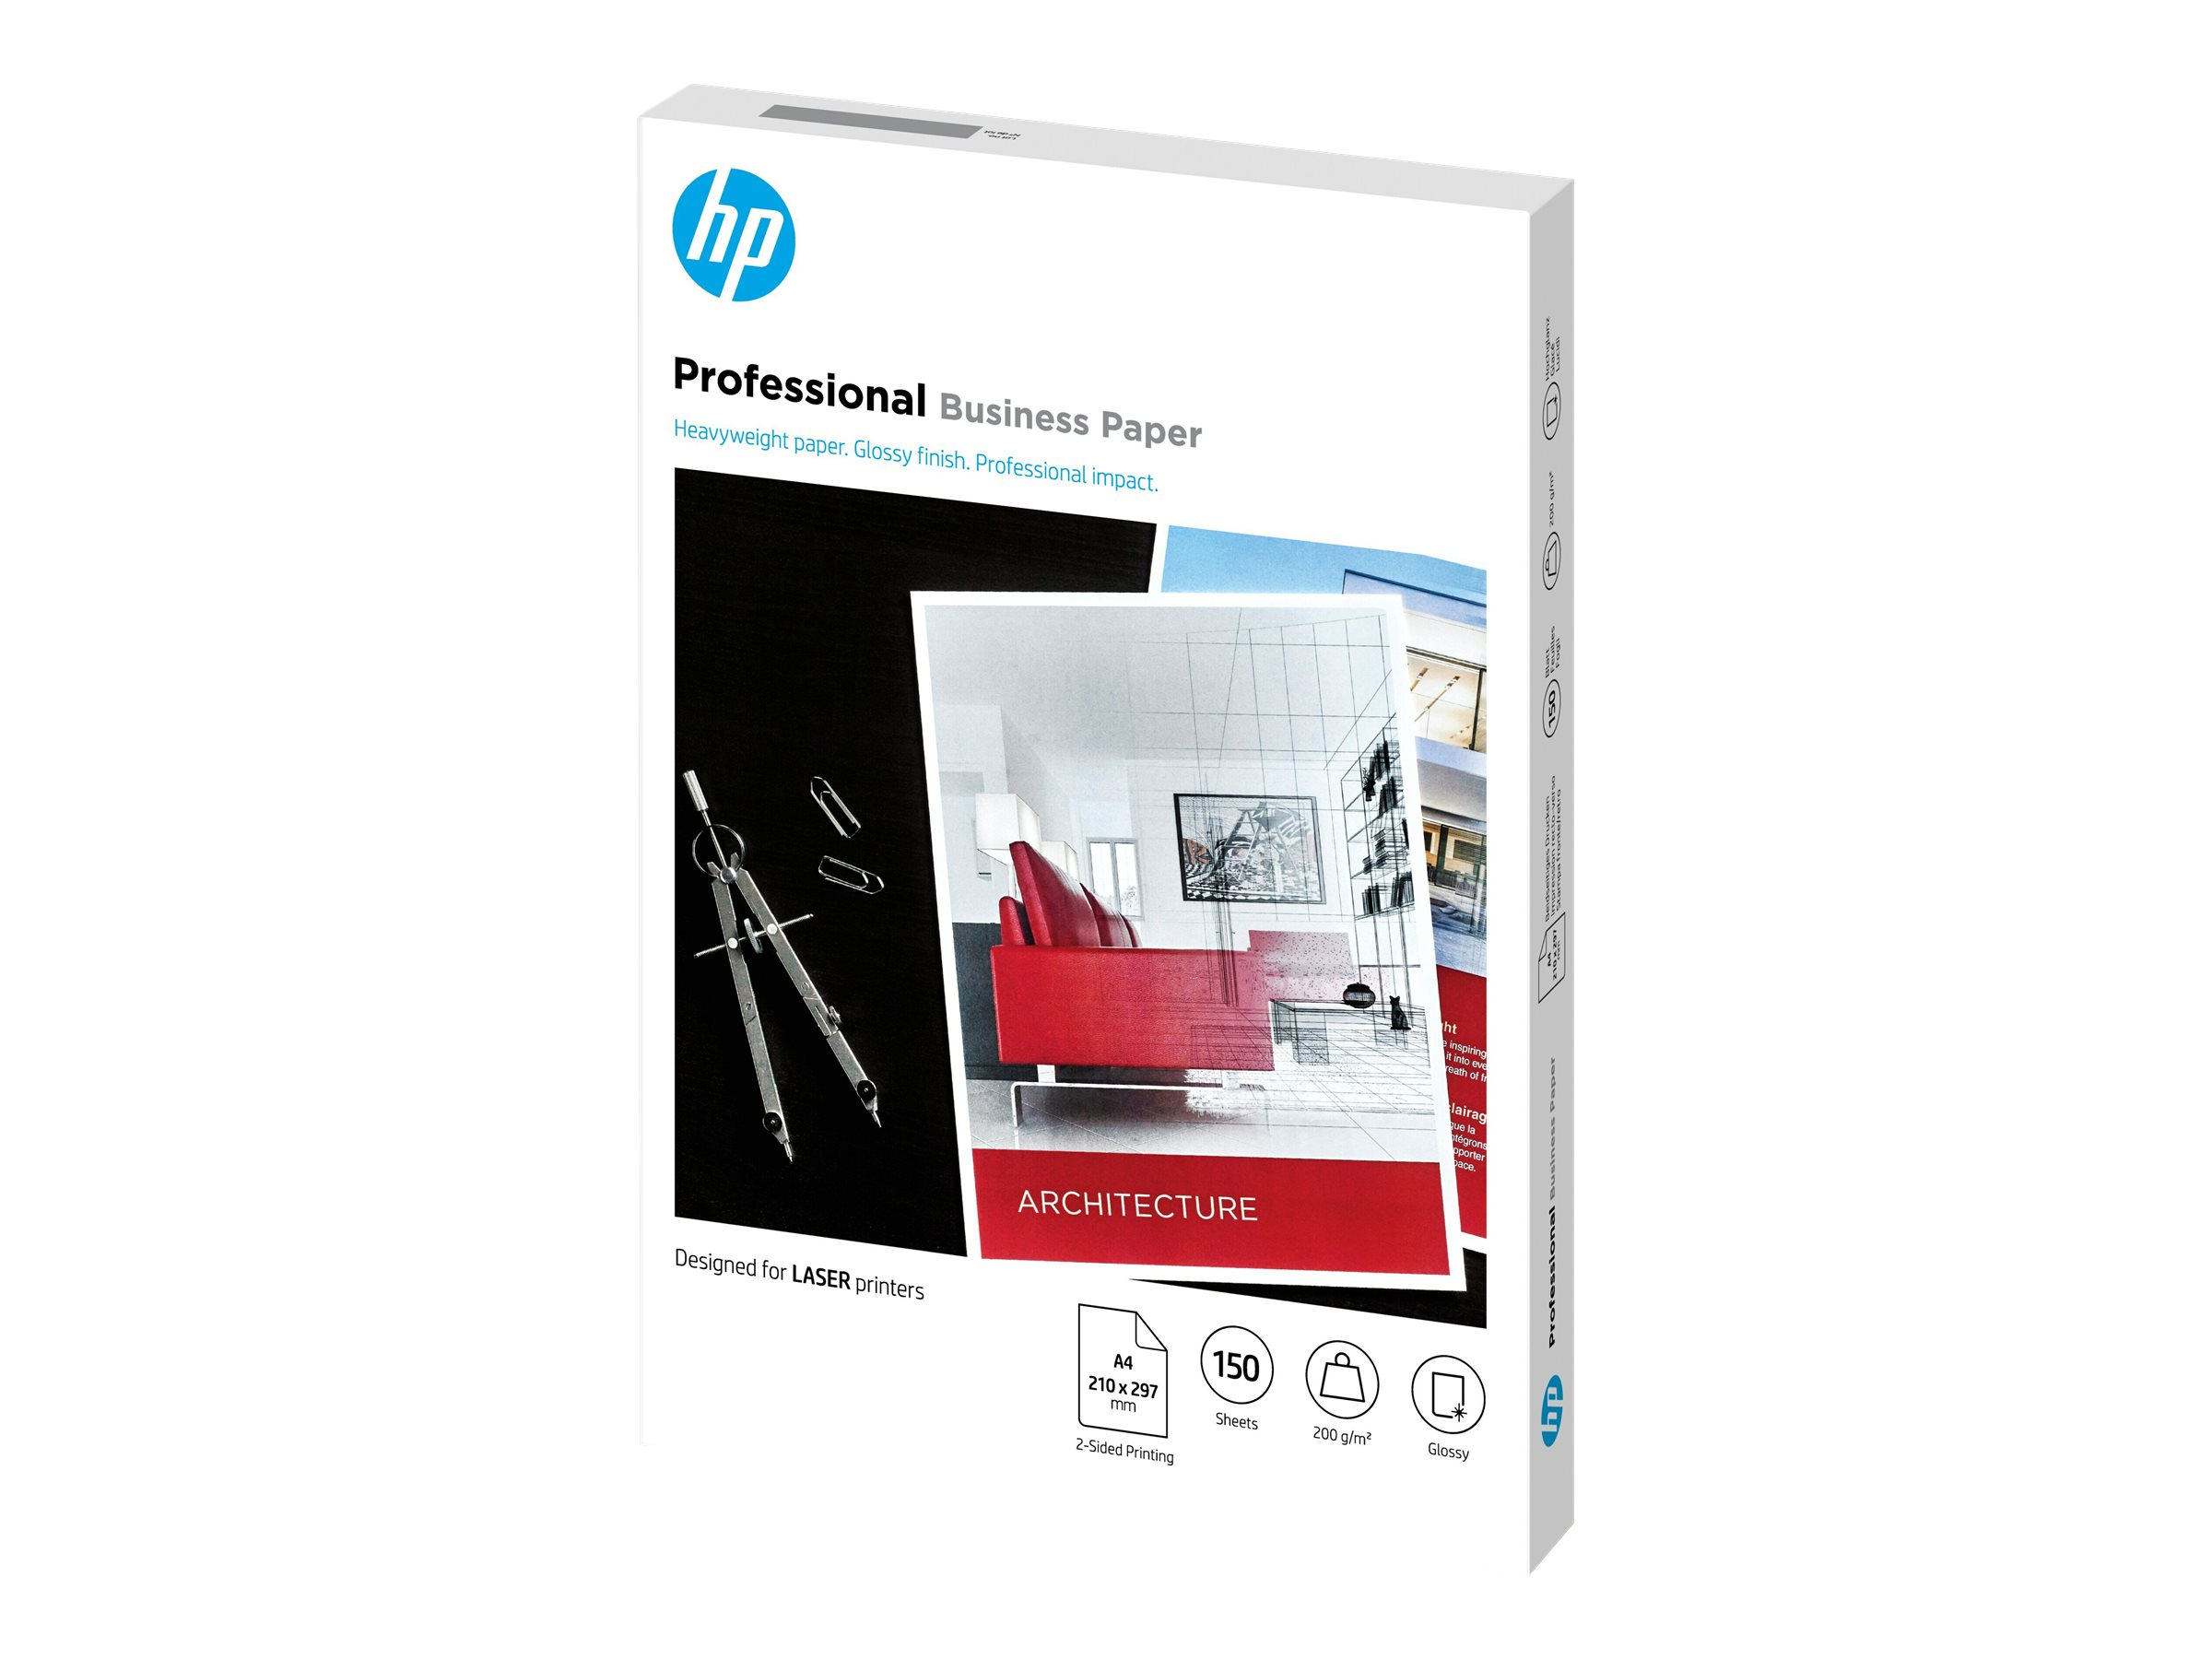 Hp professional glossy paper glaenzend a4 210 x 297 mm 200 g m 150 blatt fotopapier fuer laserjet mfp m42625 mfp m438 mfp m442 mfp m443 neverstop 1001 1202 11992692 7mv83a